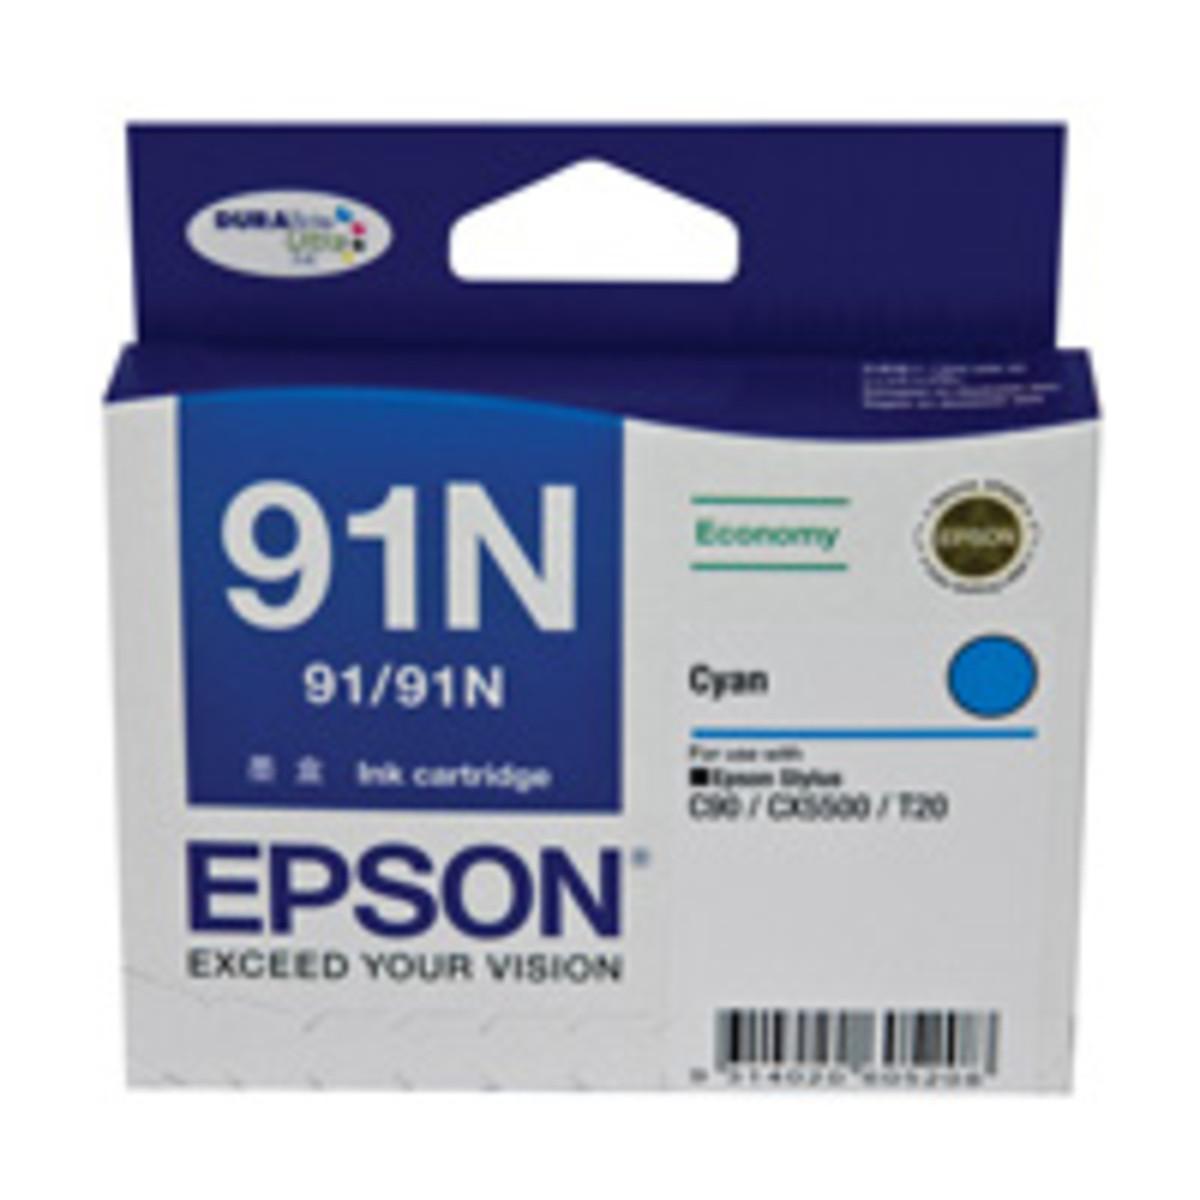 Epson 91N Cyan Ink Cartridge